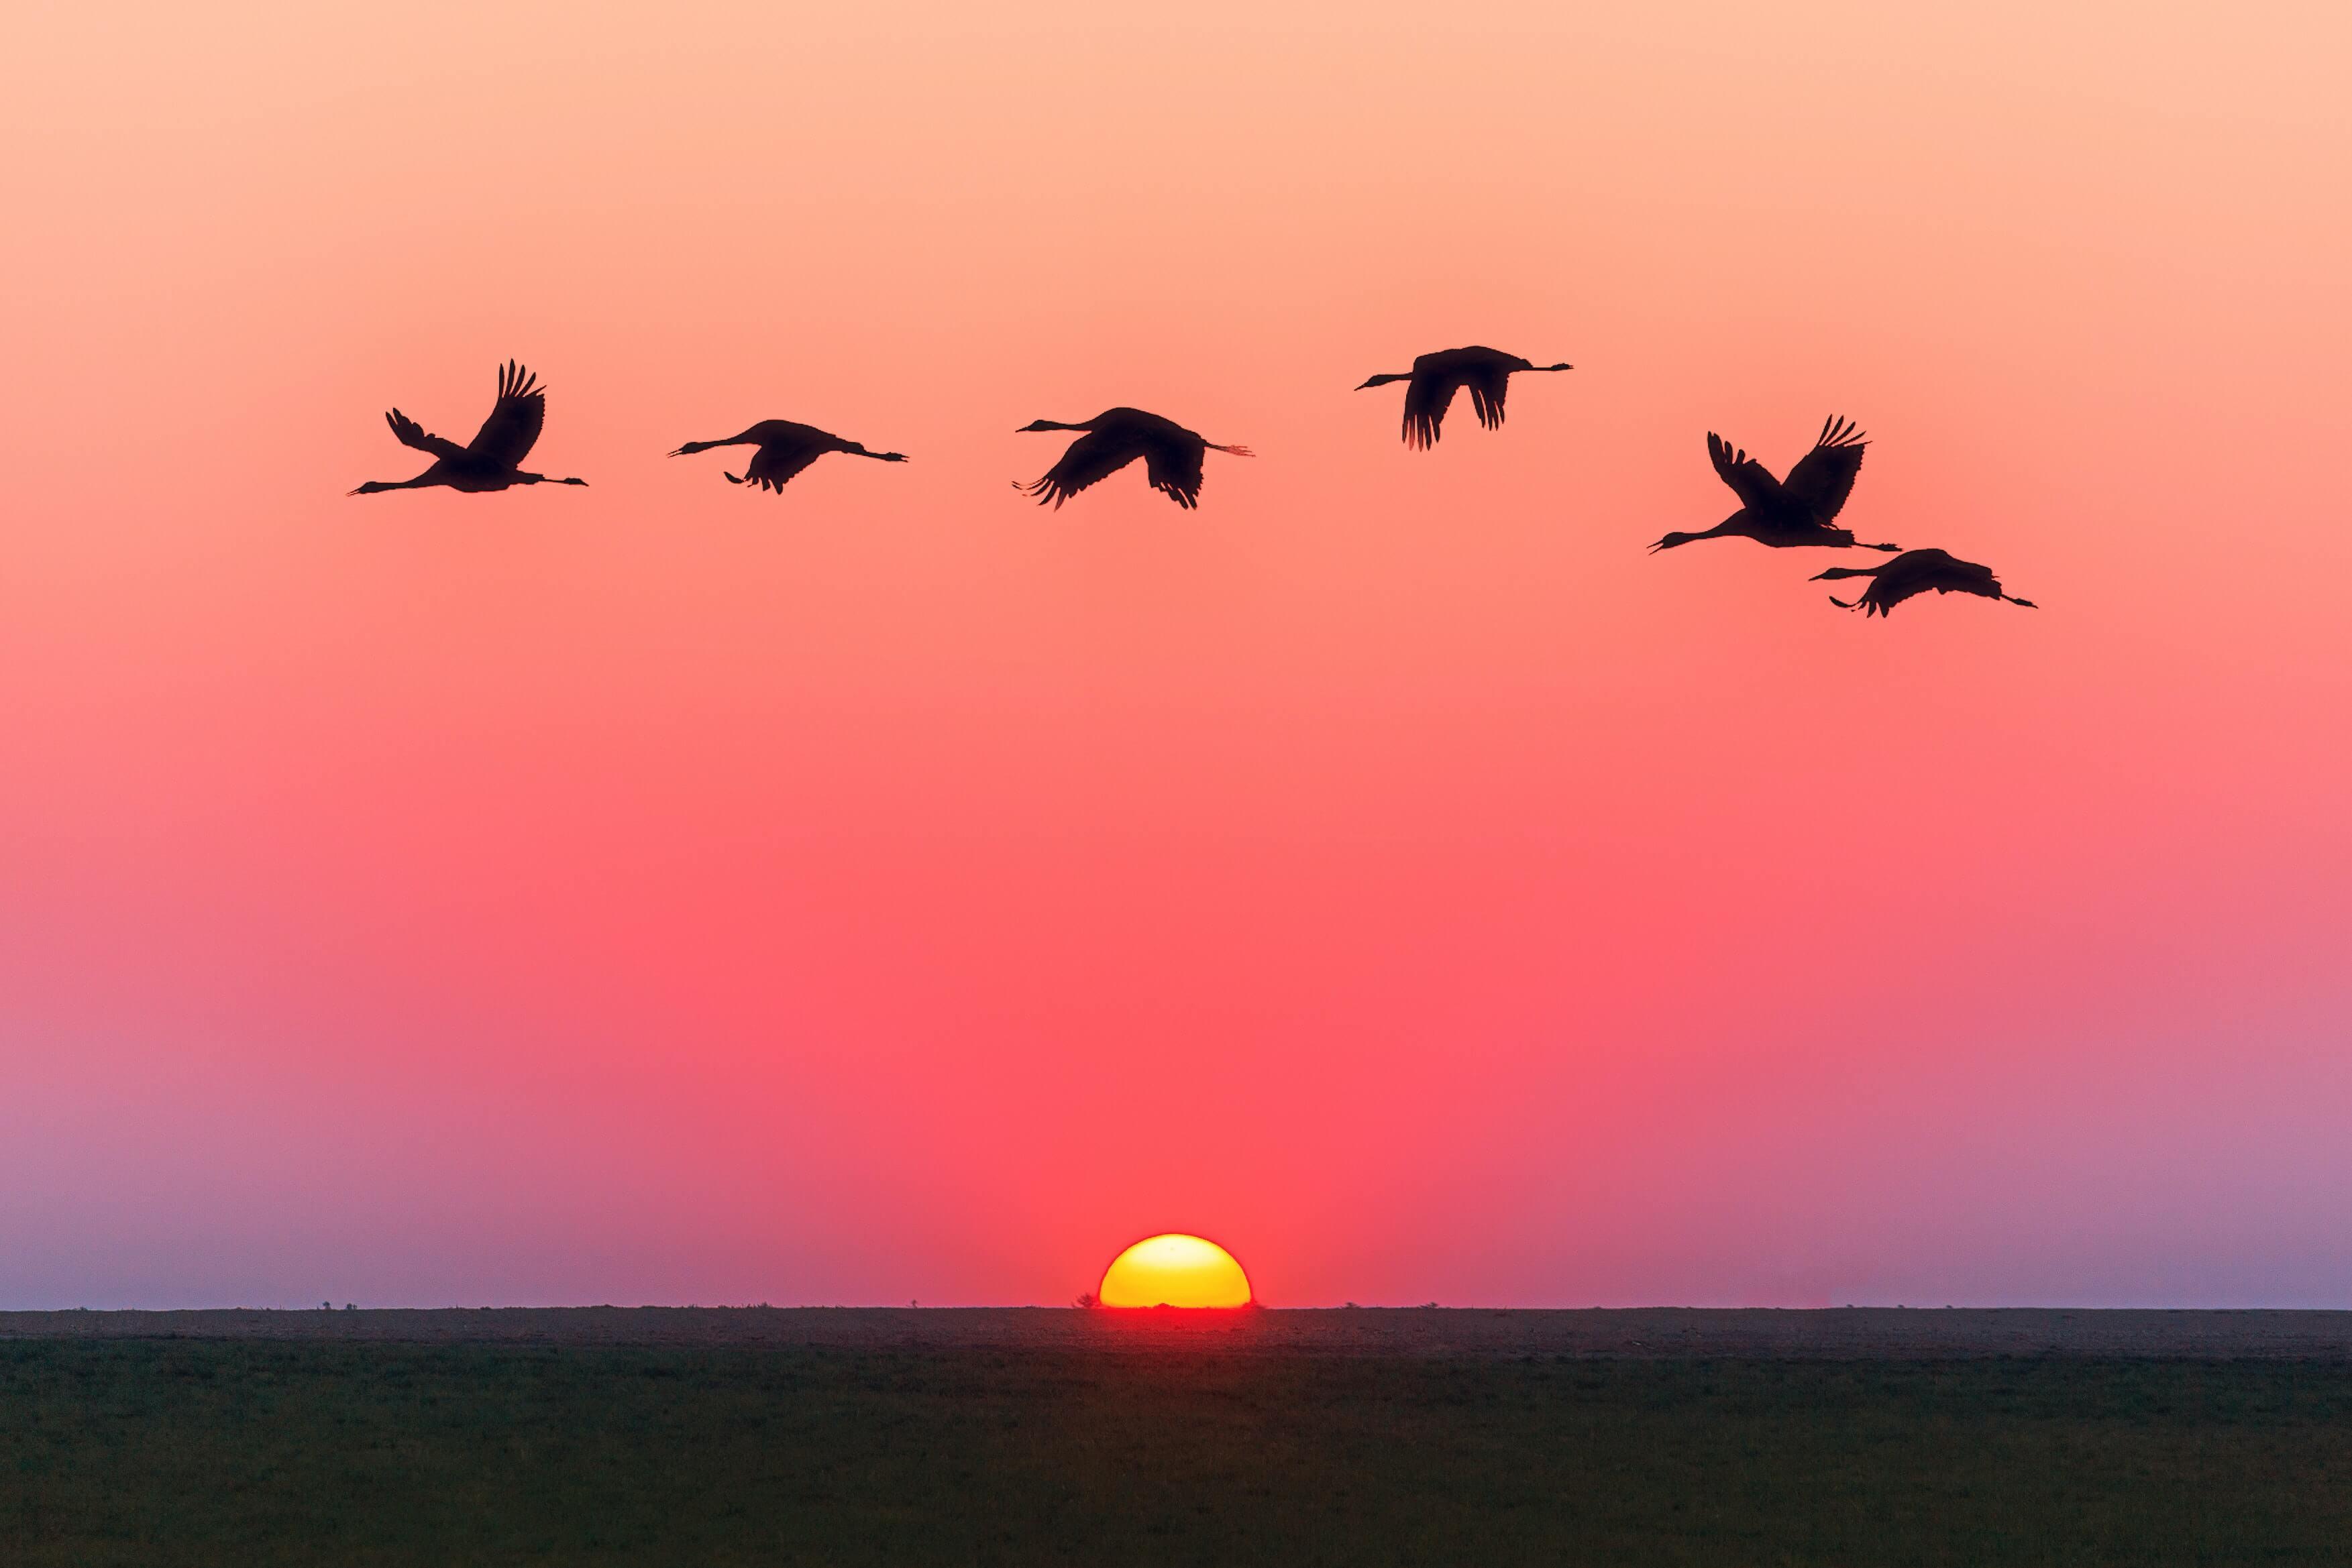 Sunrise with flying ducks